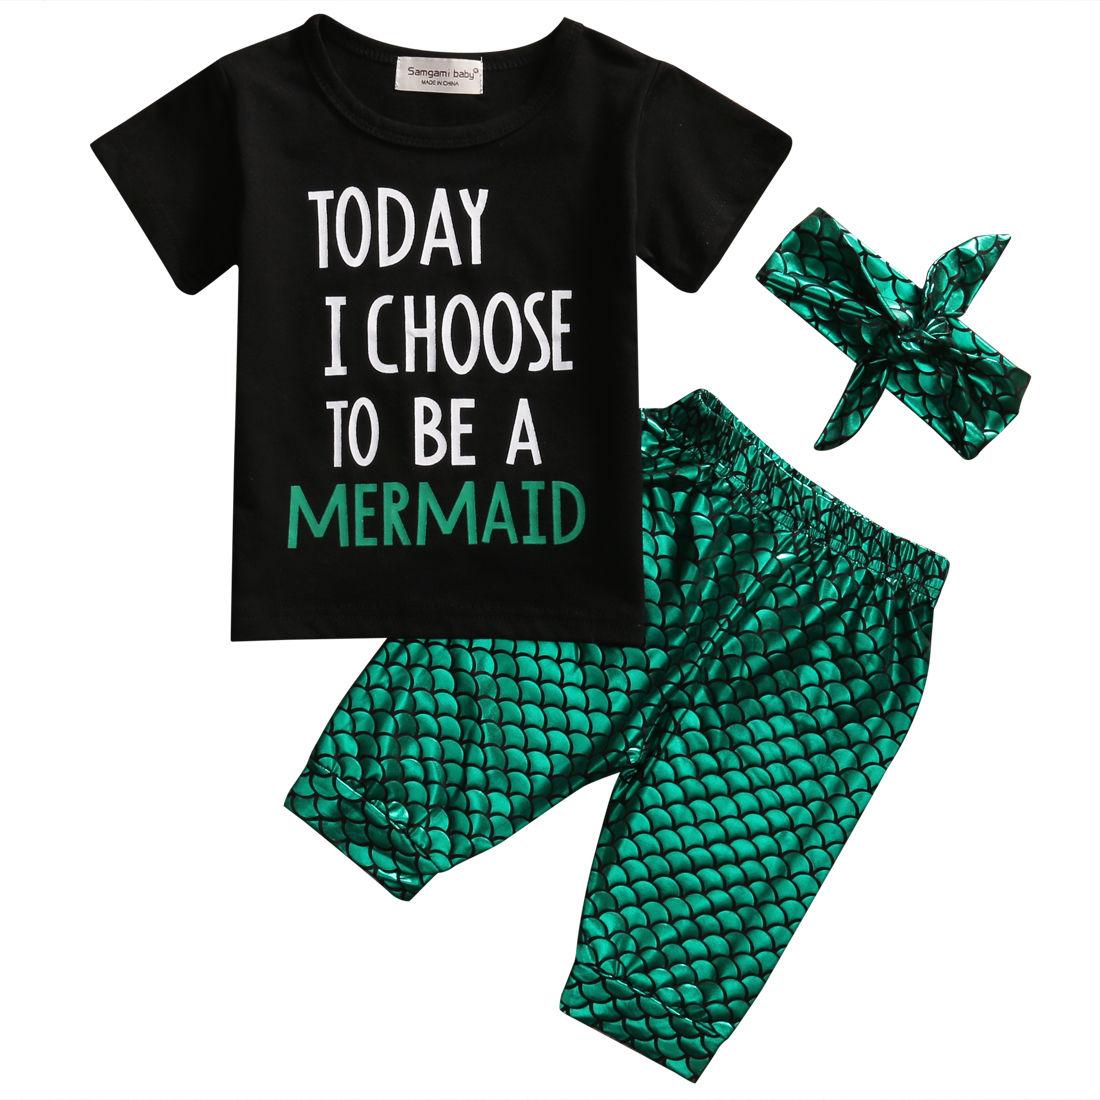 Mermaid Toddler Baby Kids Girl Clothes Set Short Sleeve Tops T-Shirts Shorts Headband 3pcs Outfits Set Clothing Girl 1-6Y ecco ecco mp002xw00j3y